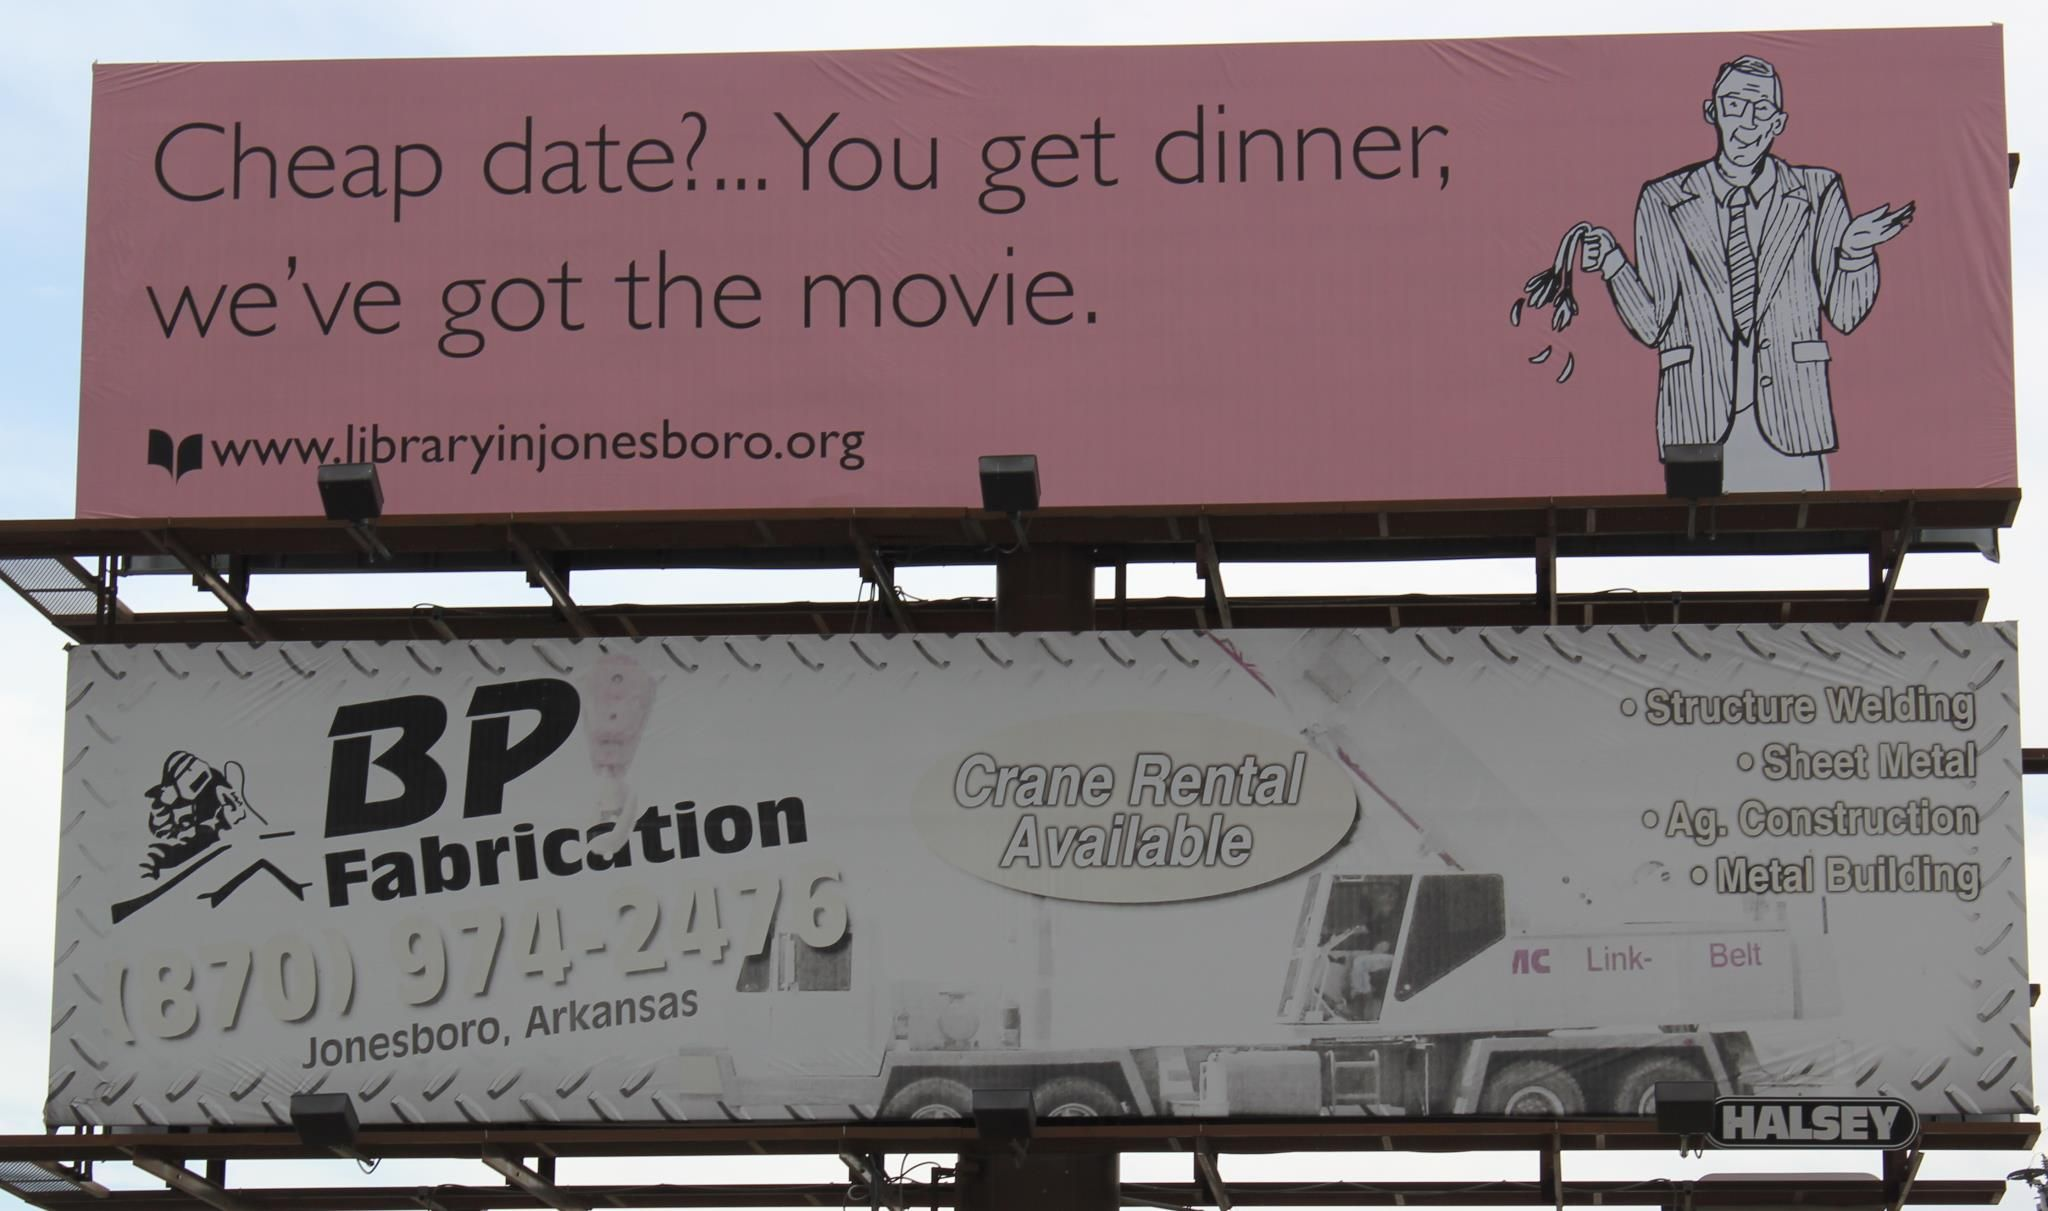 Craighead County Jonesboro Public Library's new ad ...